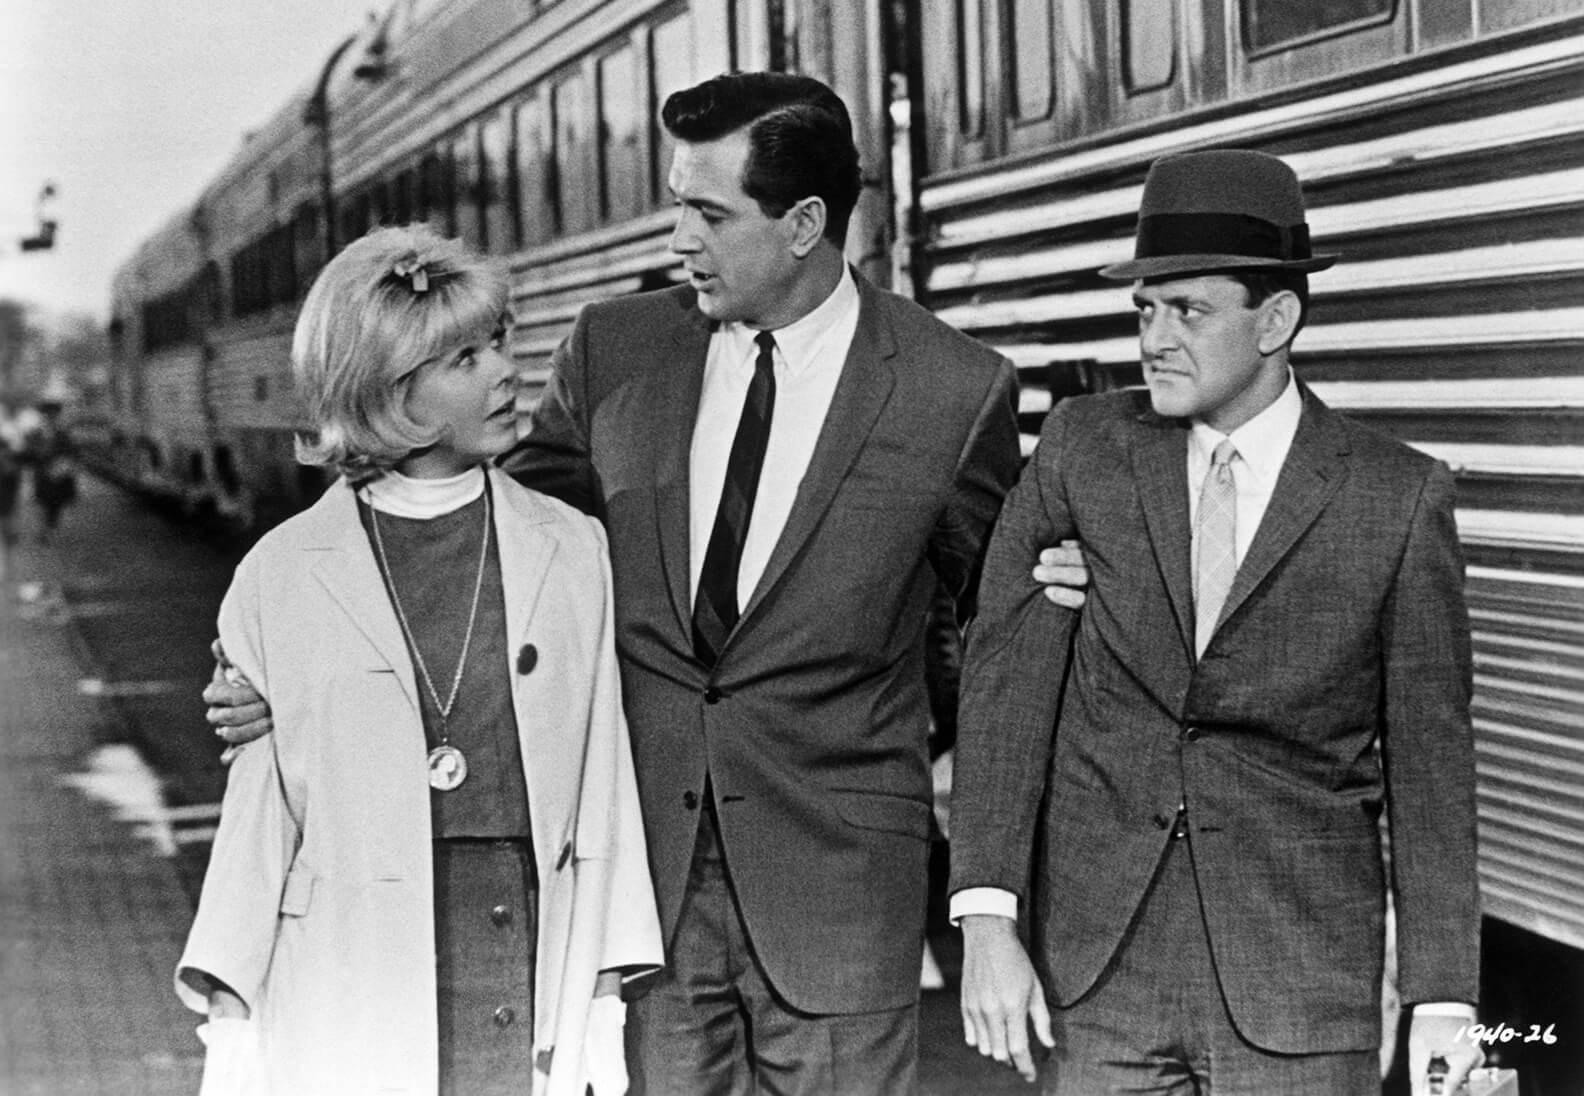 Das »brave Frauchen« – Das Trio Doris Day, Rock Hudson, Tony Randall